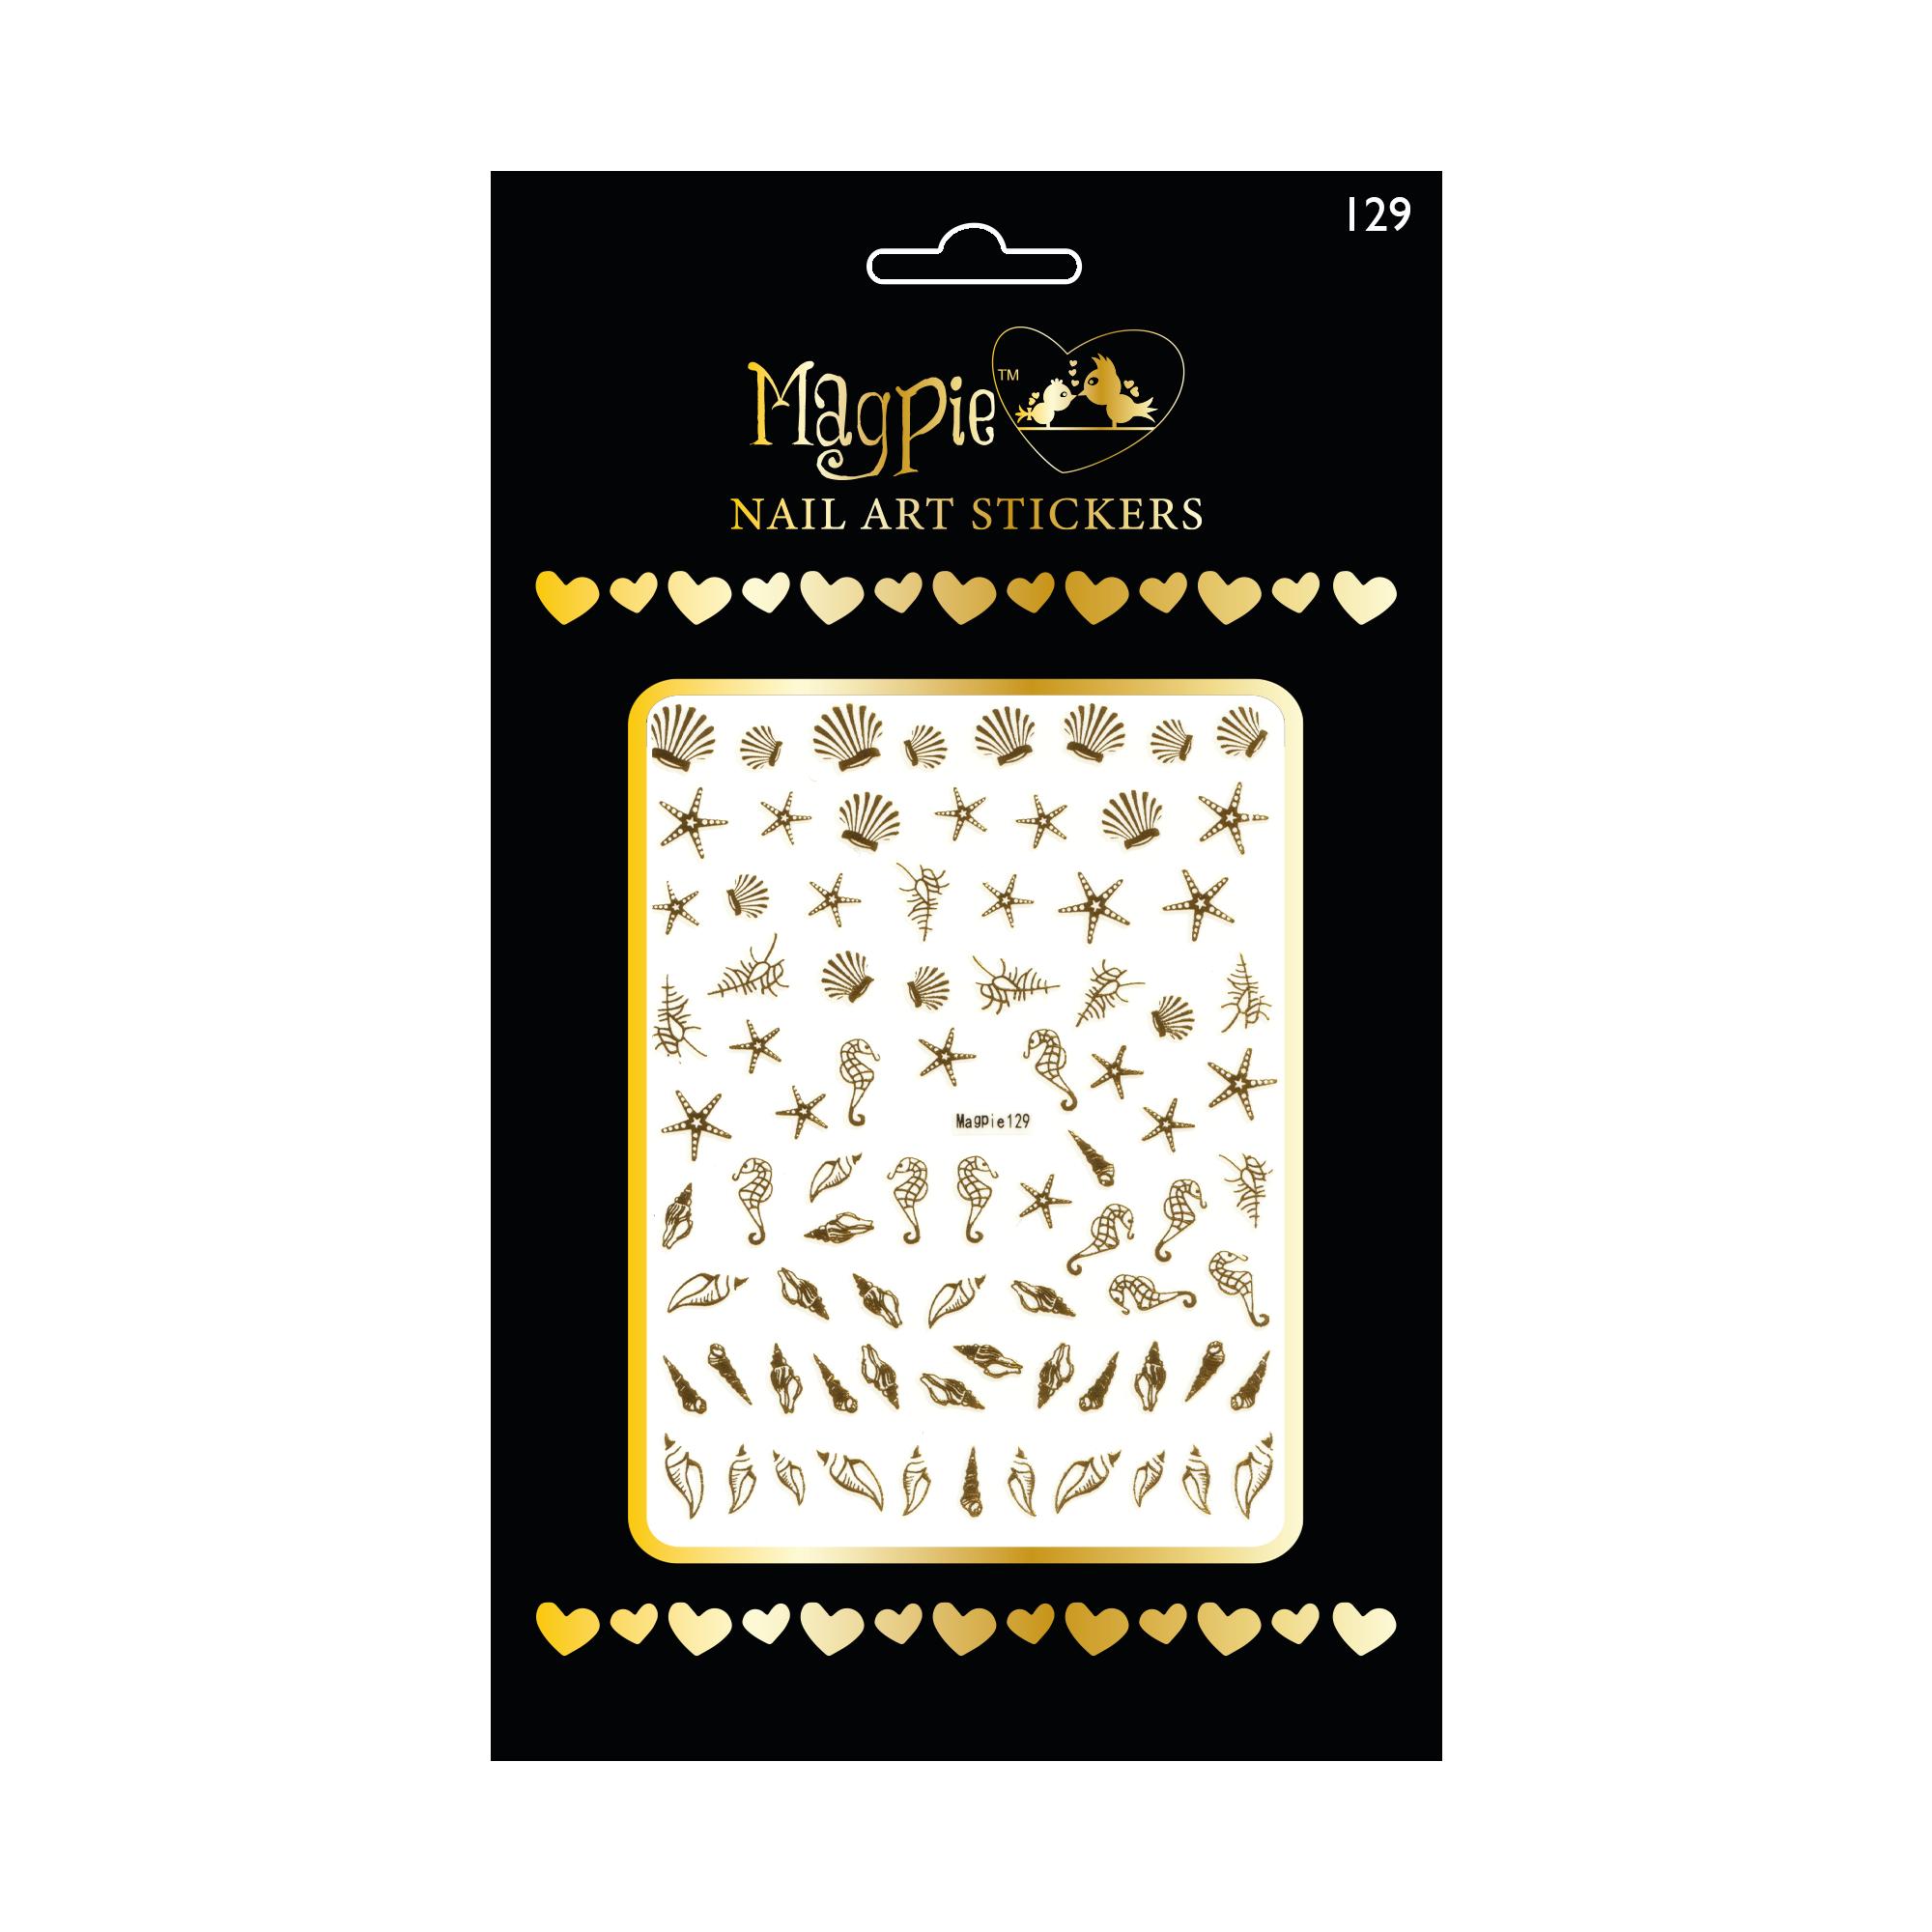 Magpie 129 stickers